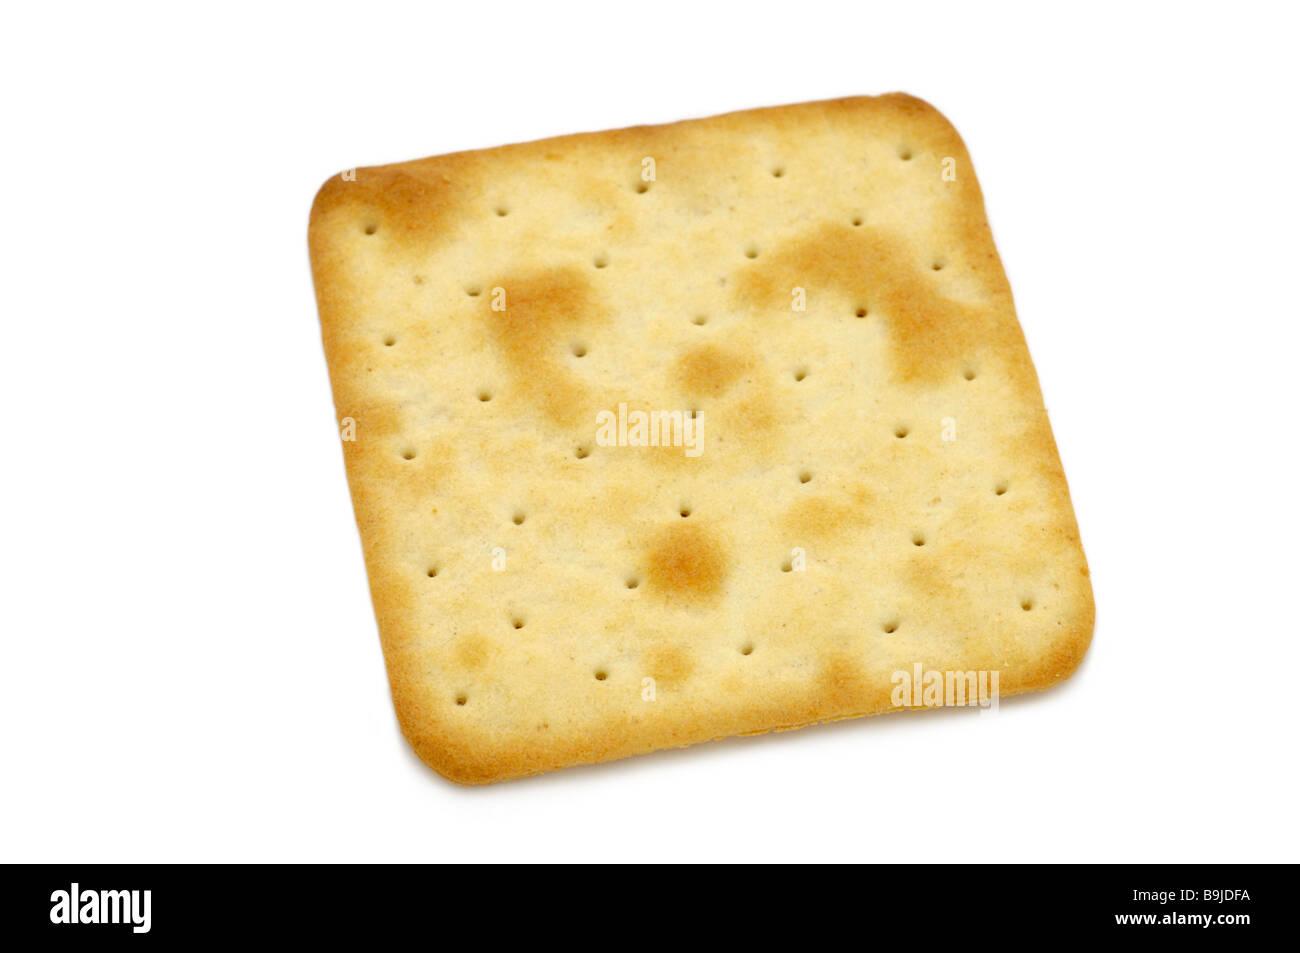 Cream/creme cracker - Stock Image